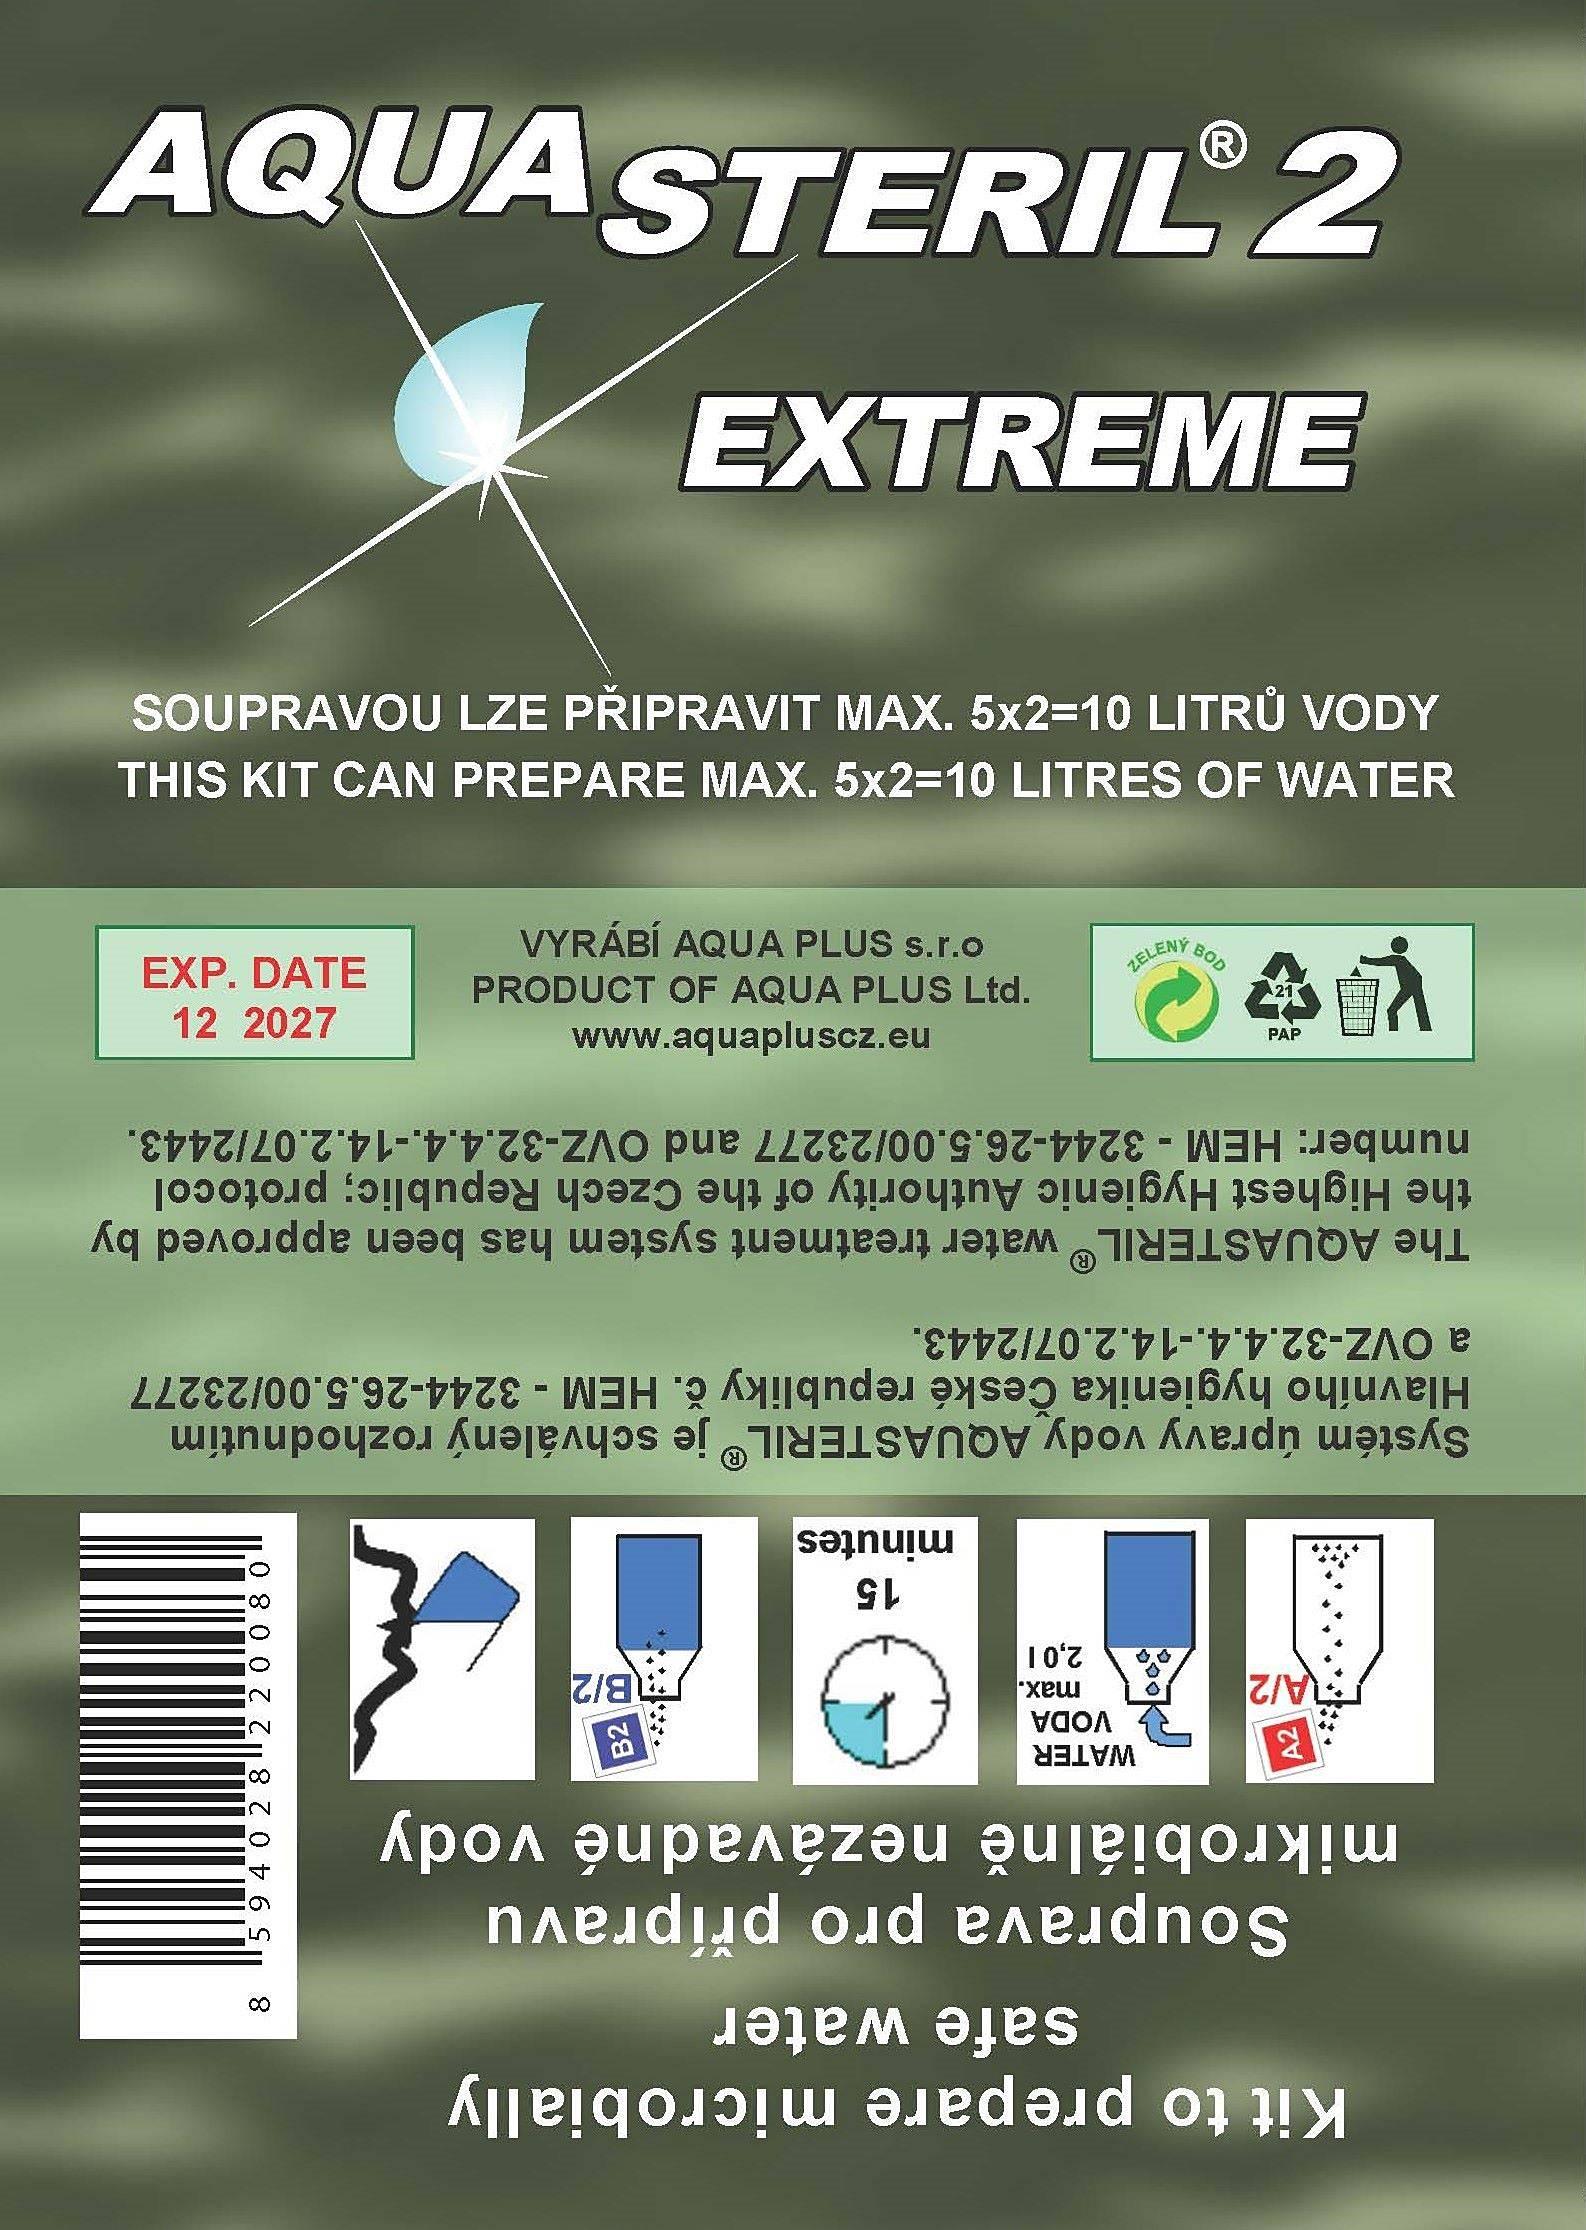 aquasteril extreme dezinfekce vody na cestách